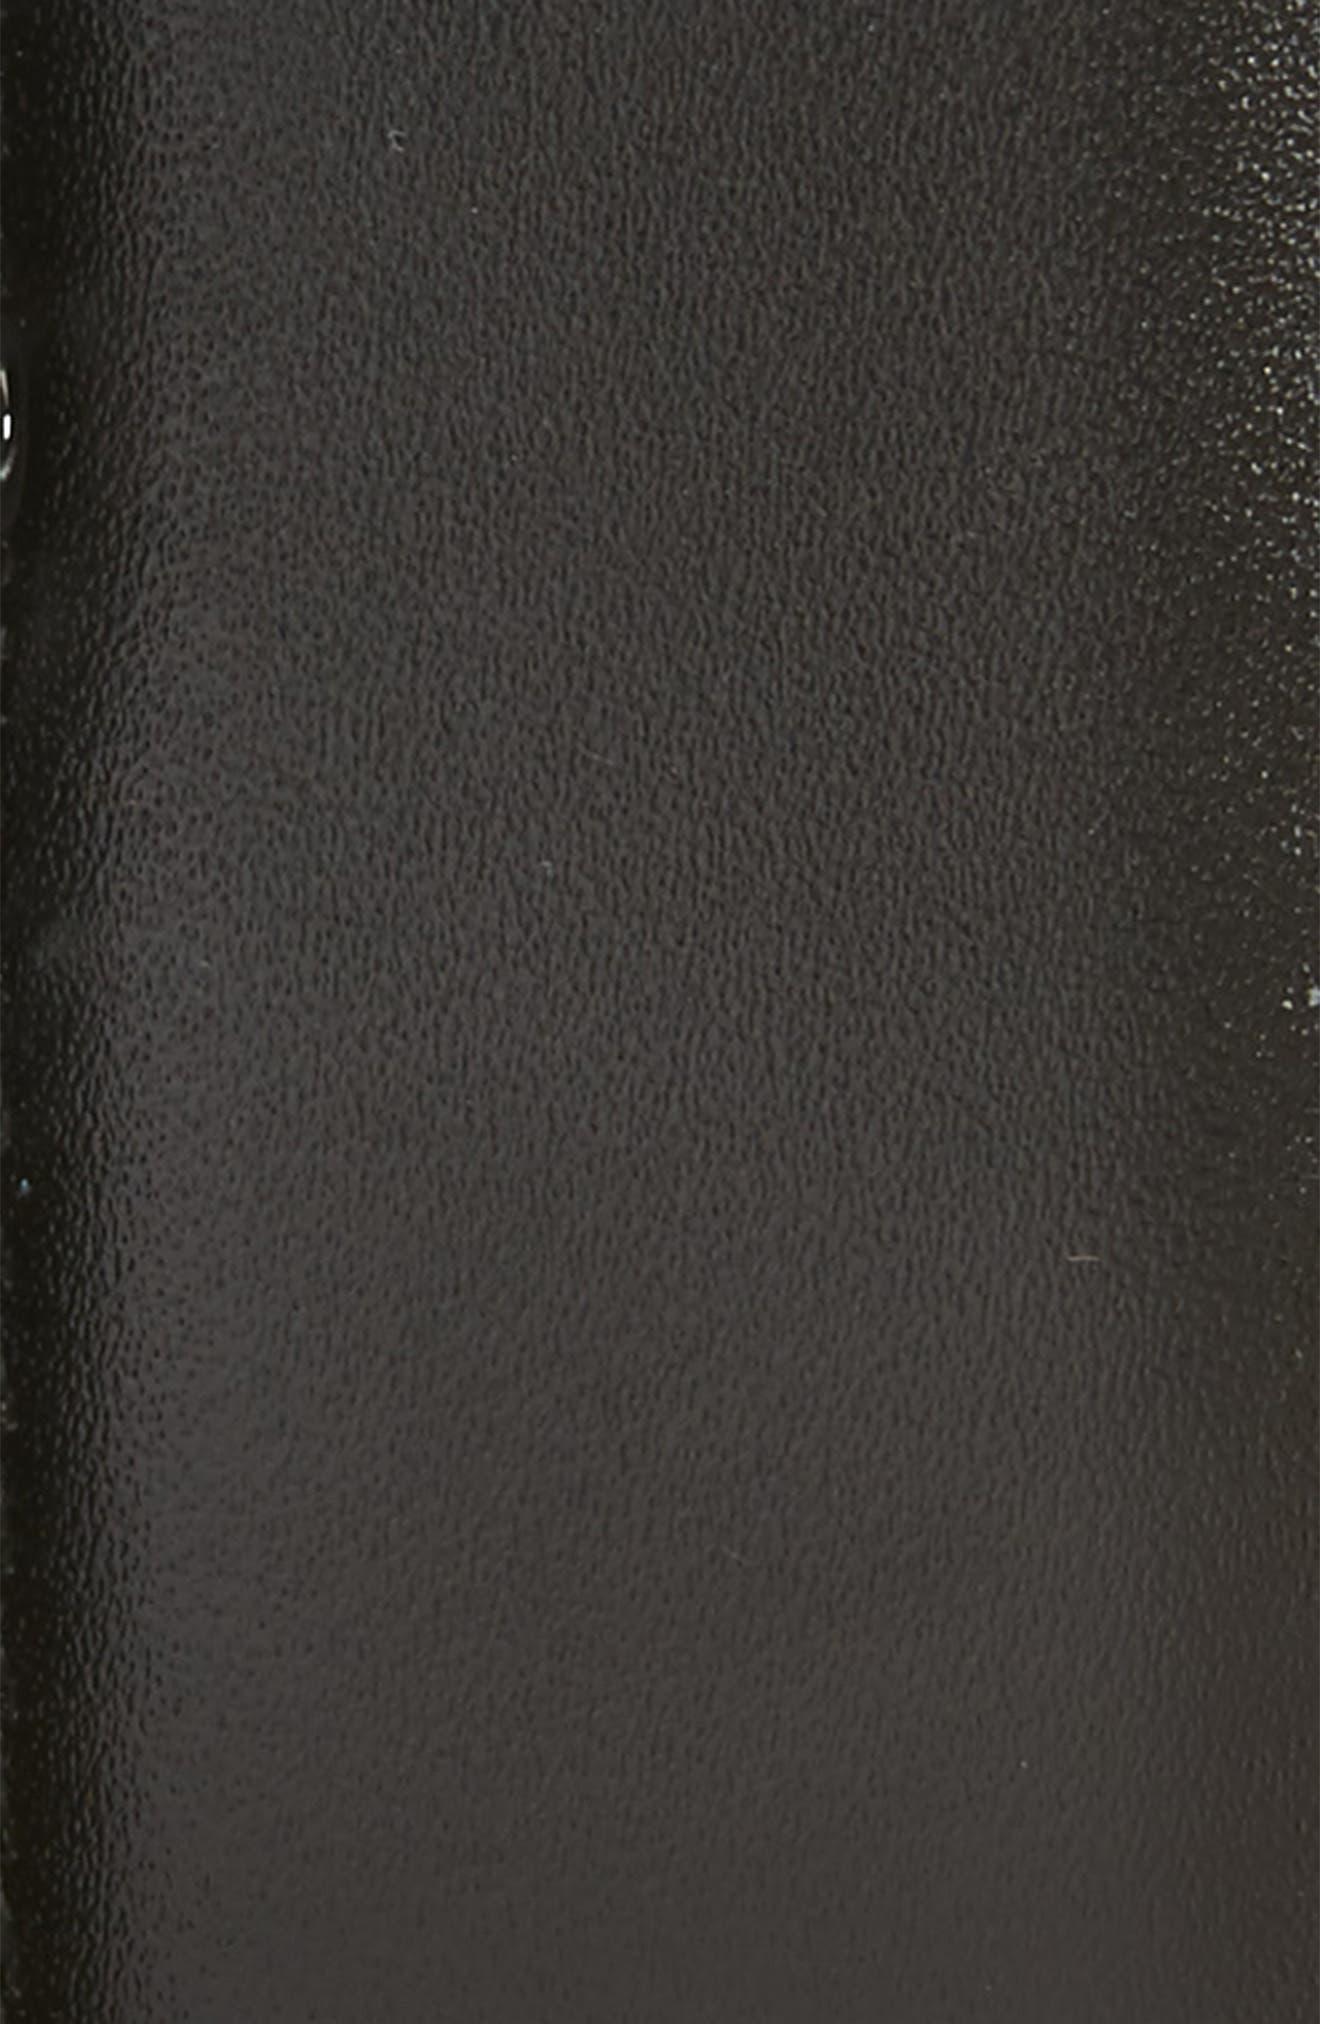 SALVATORE FERRAGAMO, Reversible Leather Belt, Alternate thumbnail 3, color, BLACK/ AUBURN